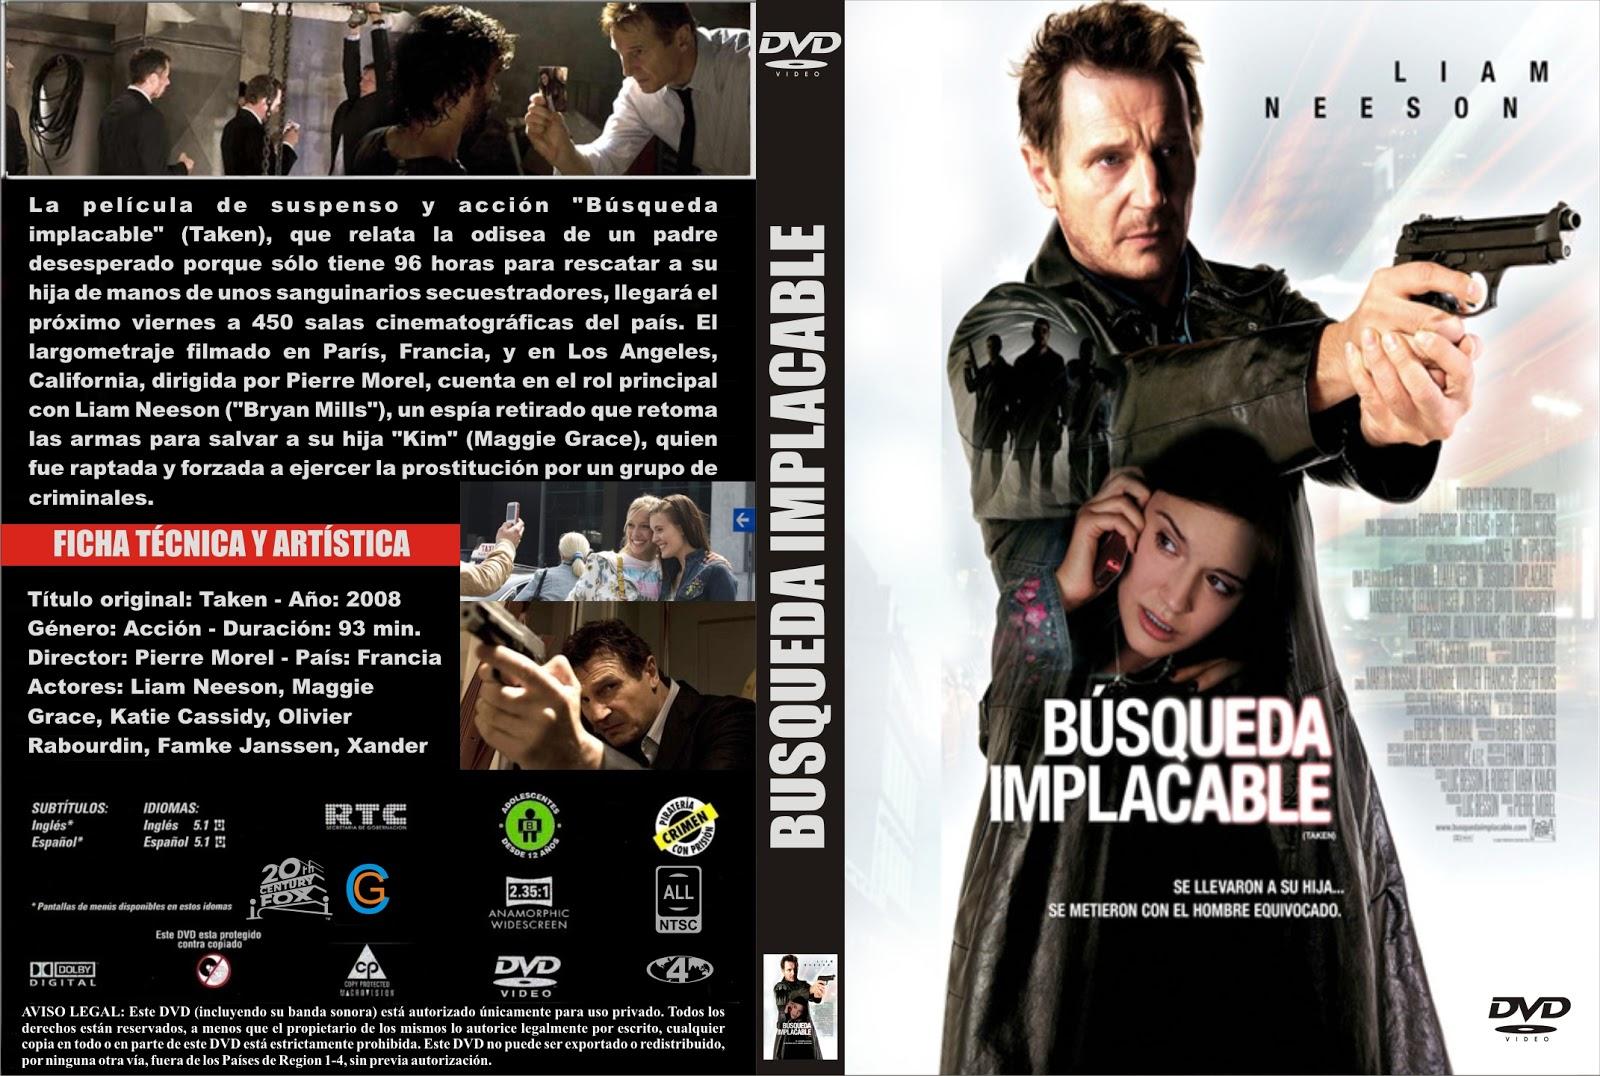 descargar busqueda implacable 2 en espanol latino